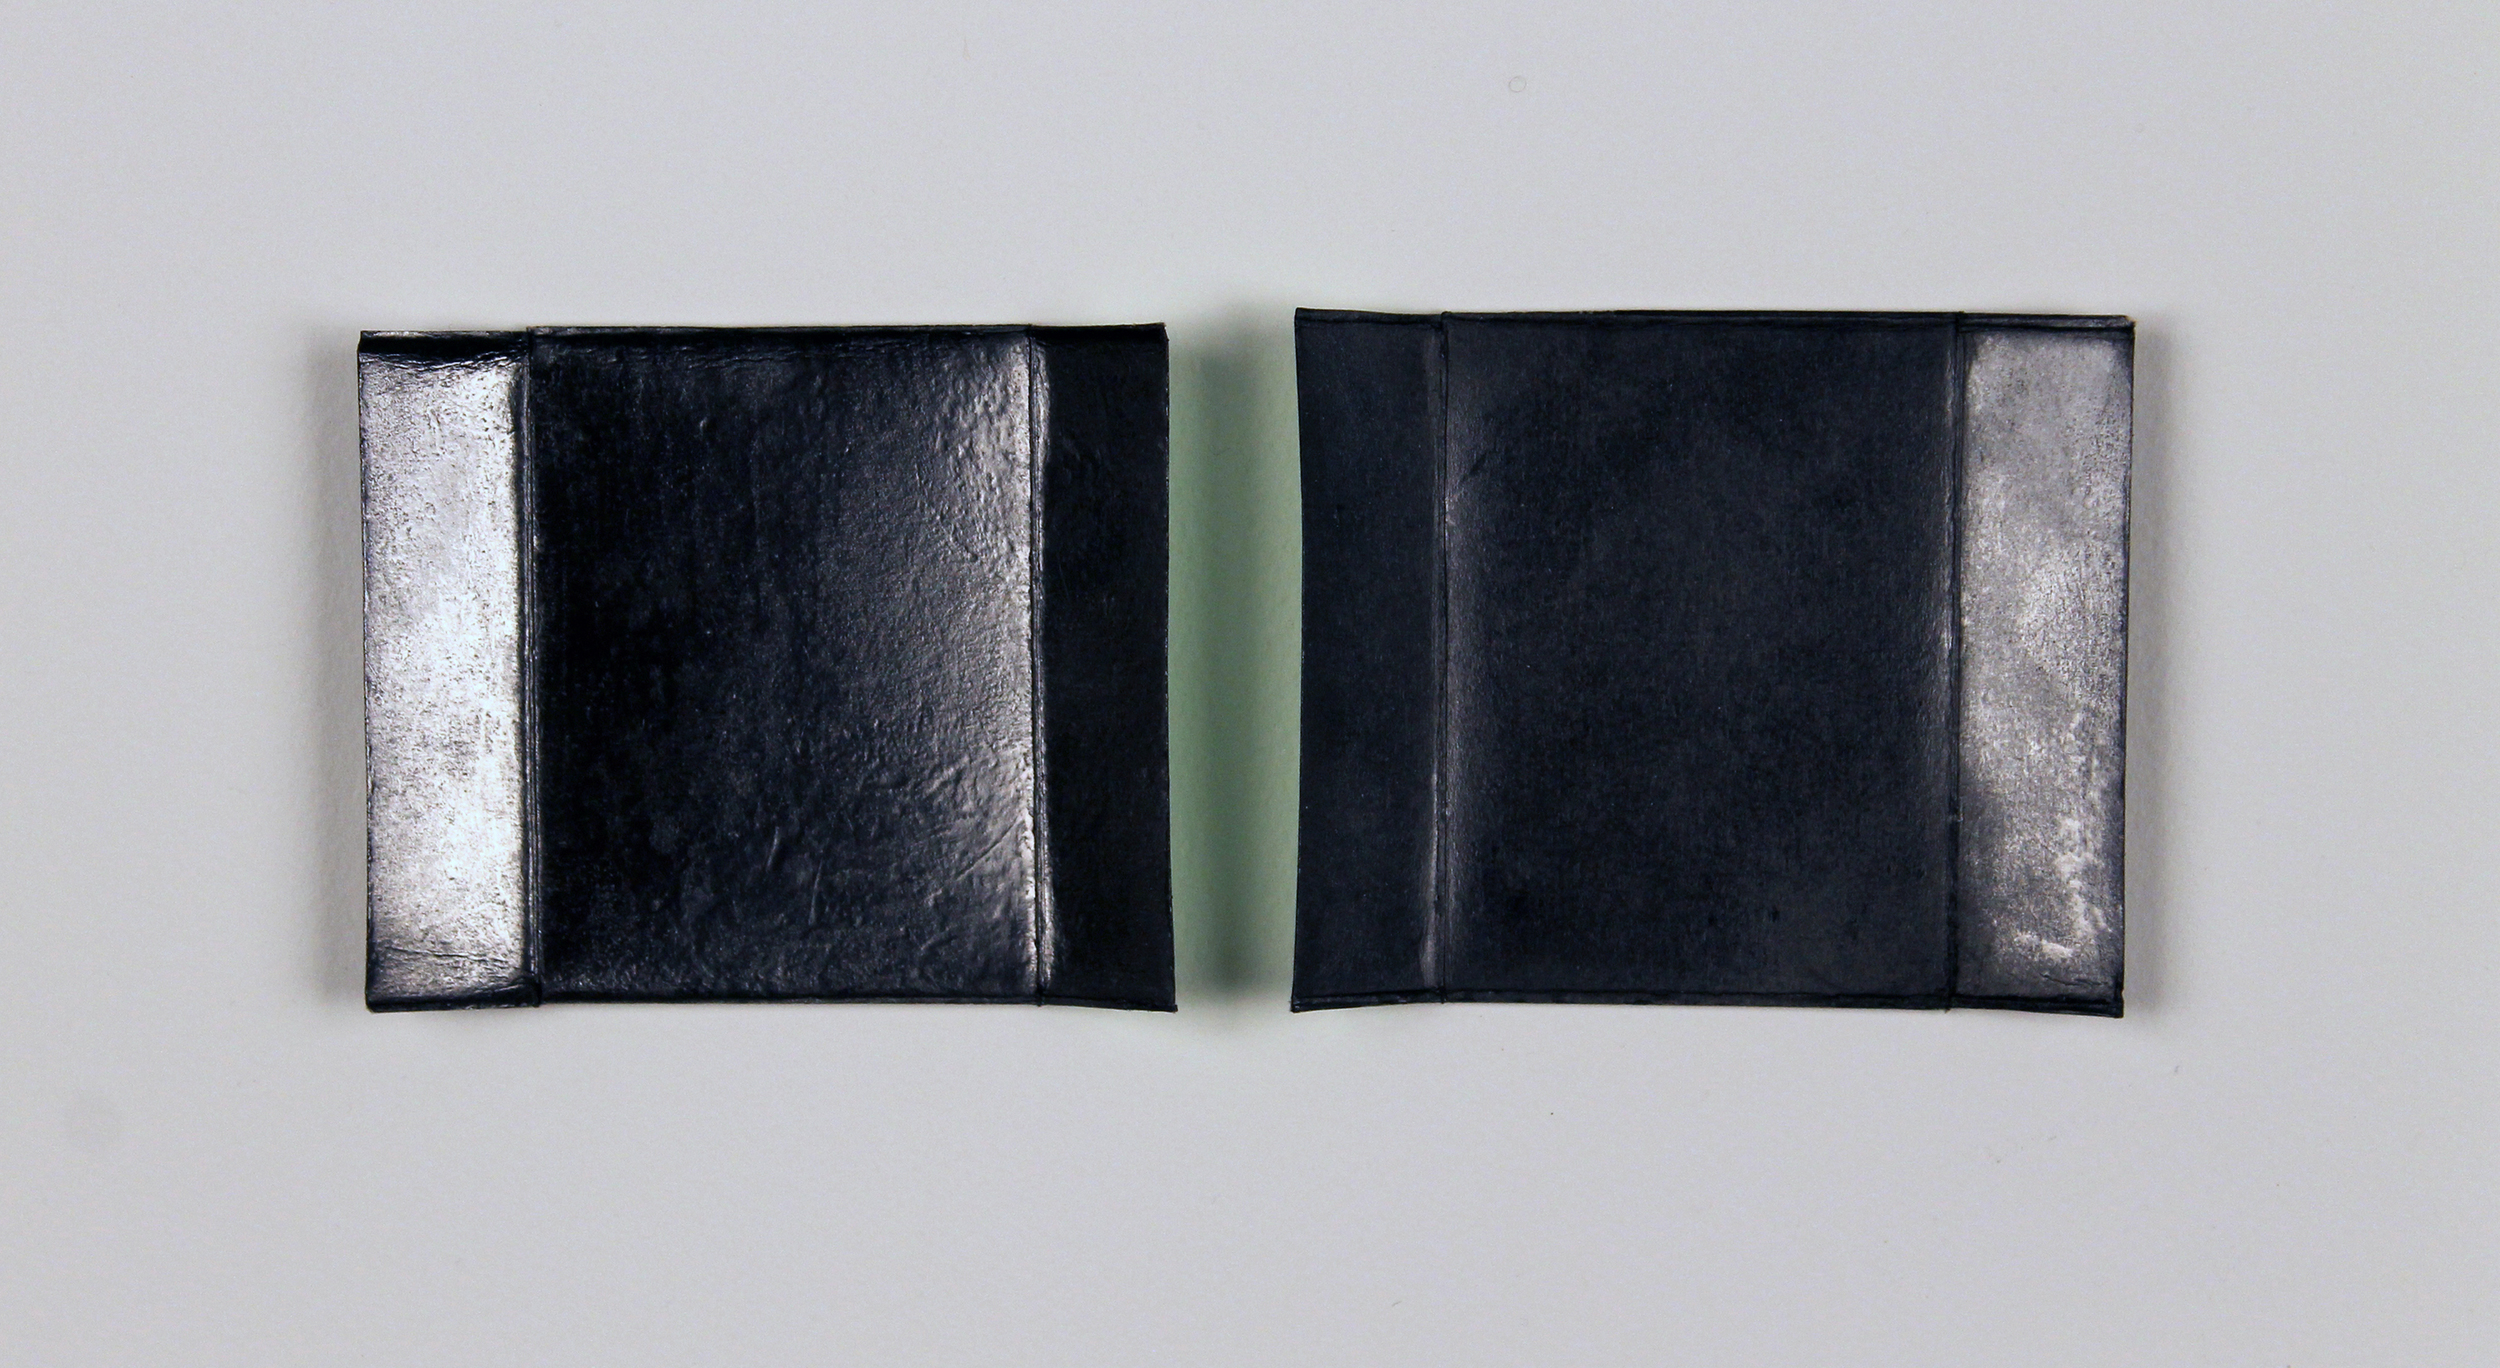 "Chroma (Green for Derek Jarman)  Graphite powder, silkscreened pigment, archival wax on cardboard, 12.25"" x 15.25"" (framed), 2013"